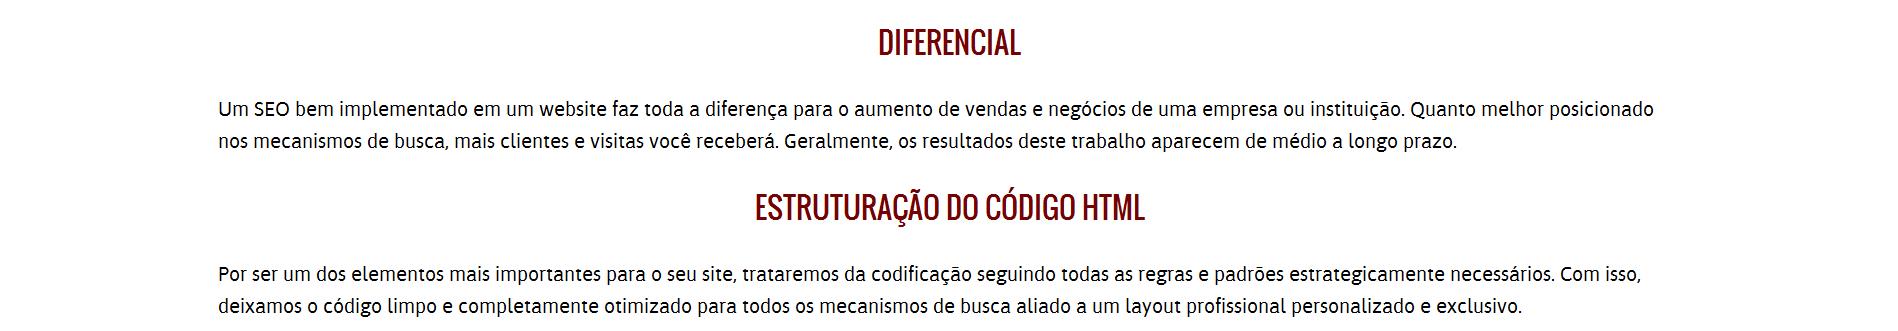 diferencial-otimizacao-sites-seo